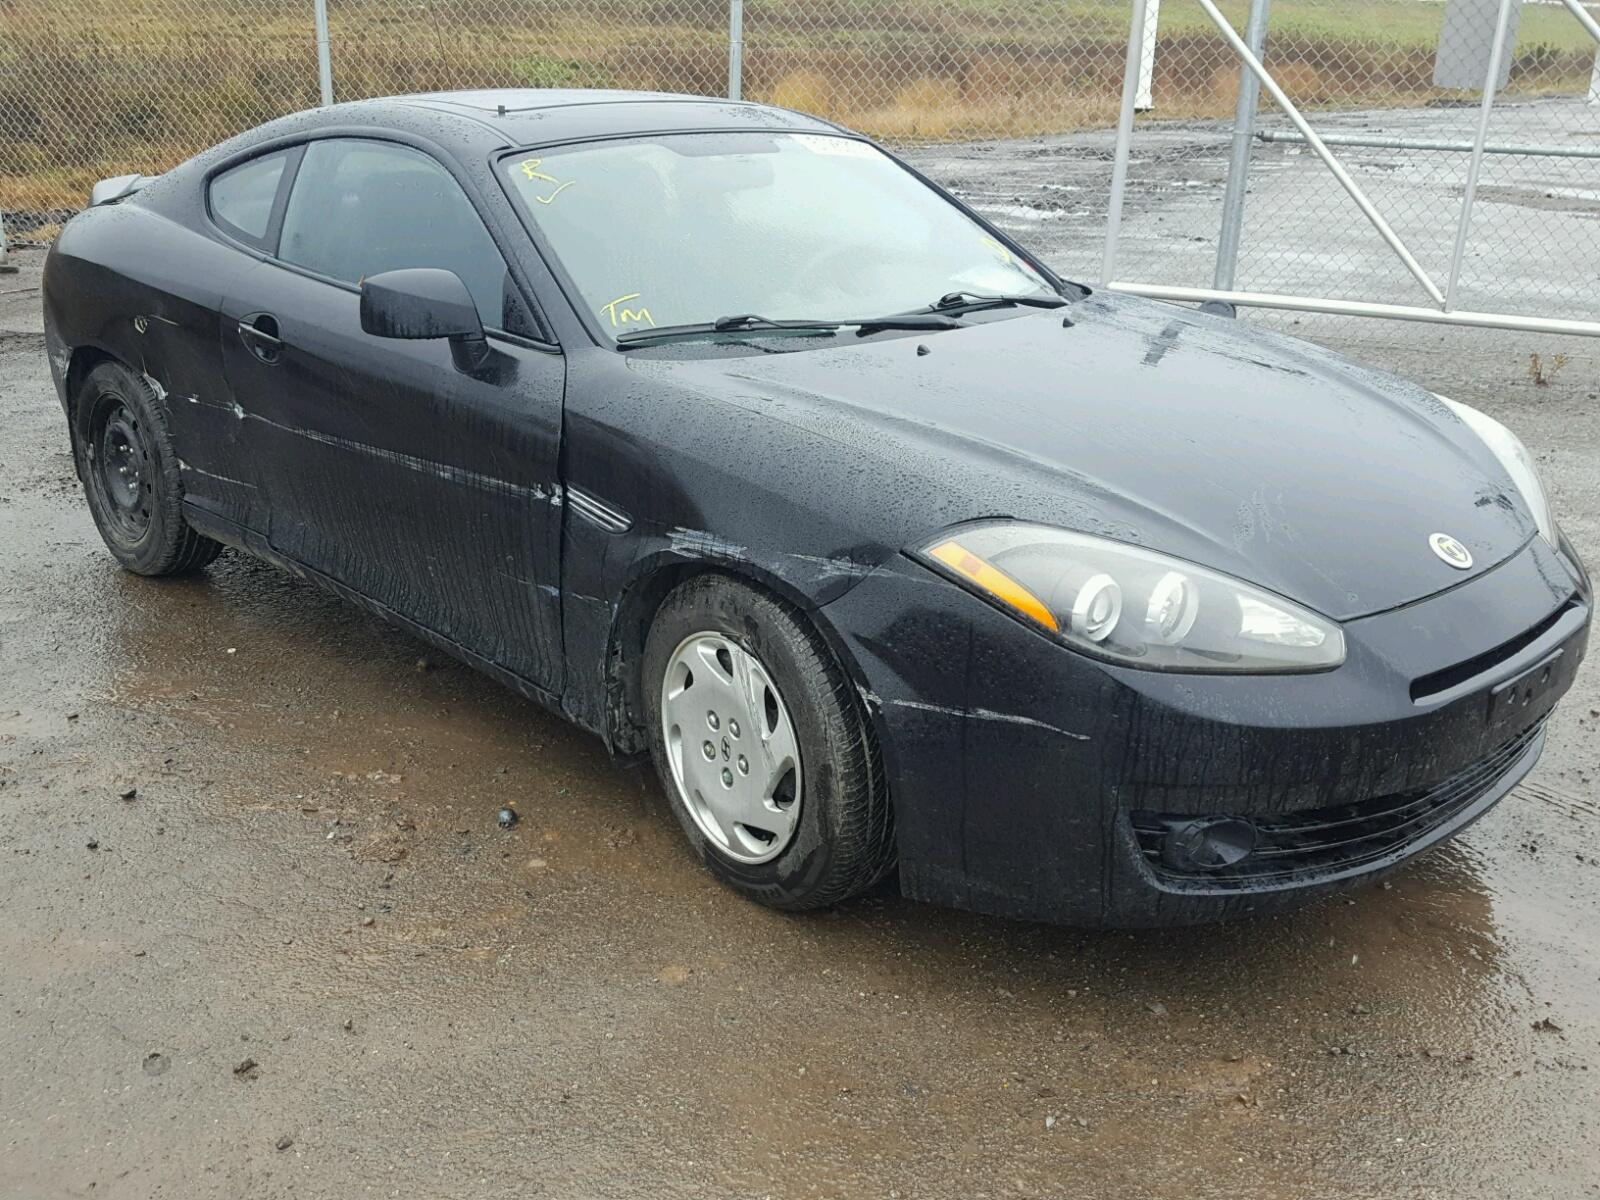 Salvage 2008 Hyundai TIBURON GS for sale